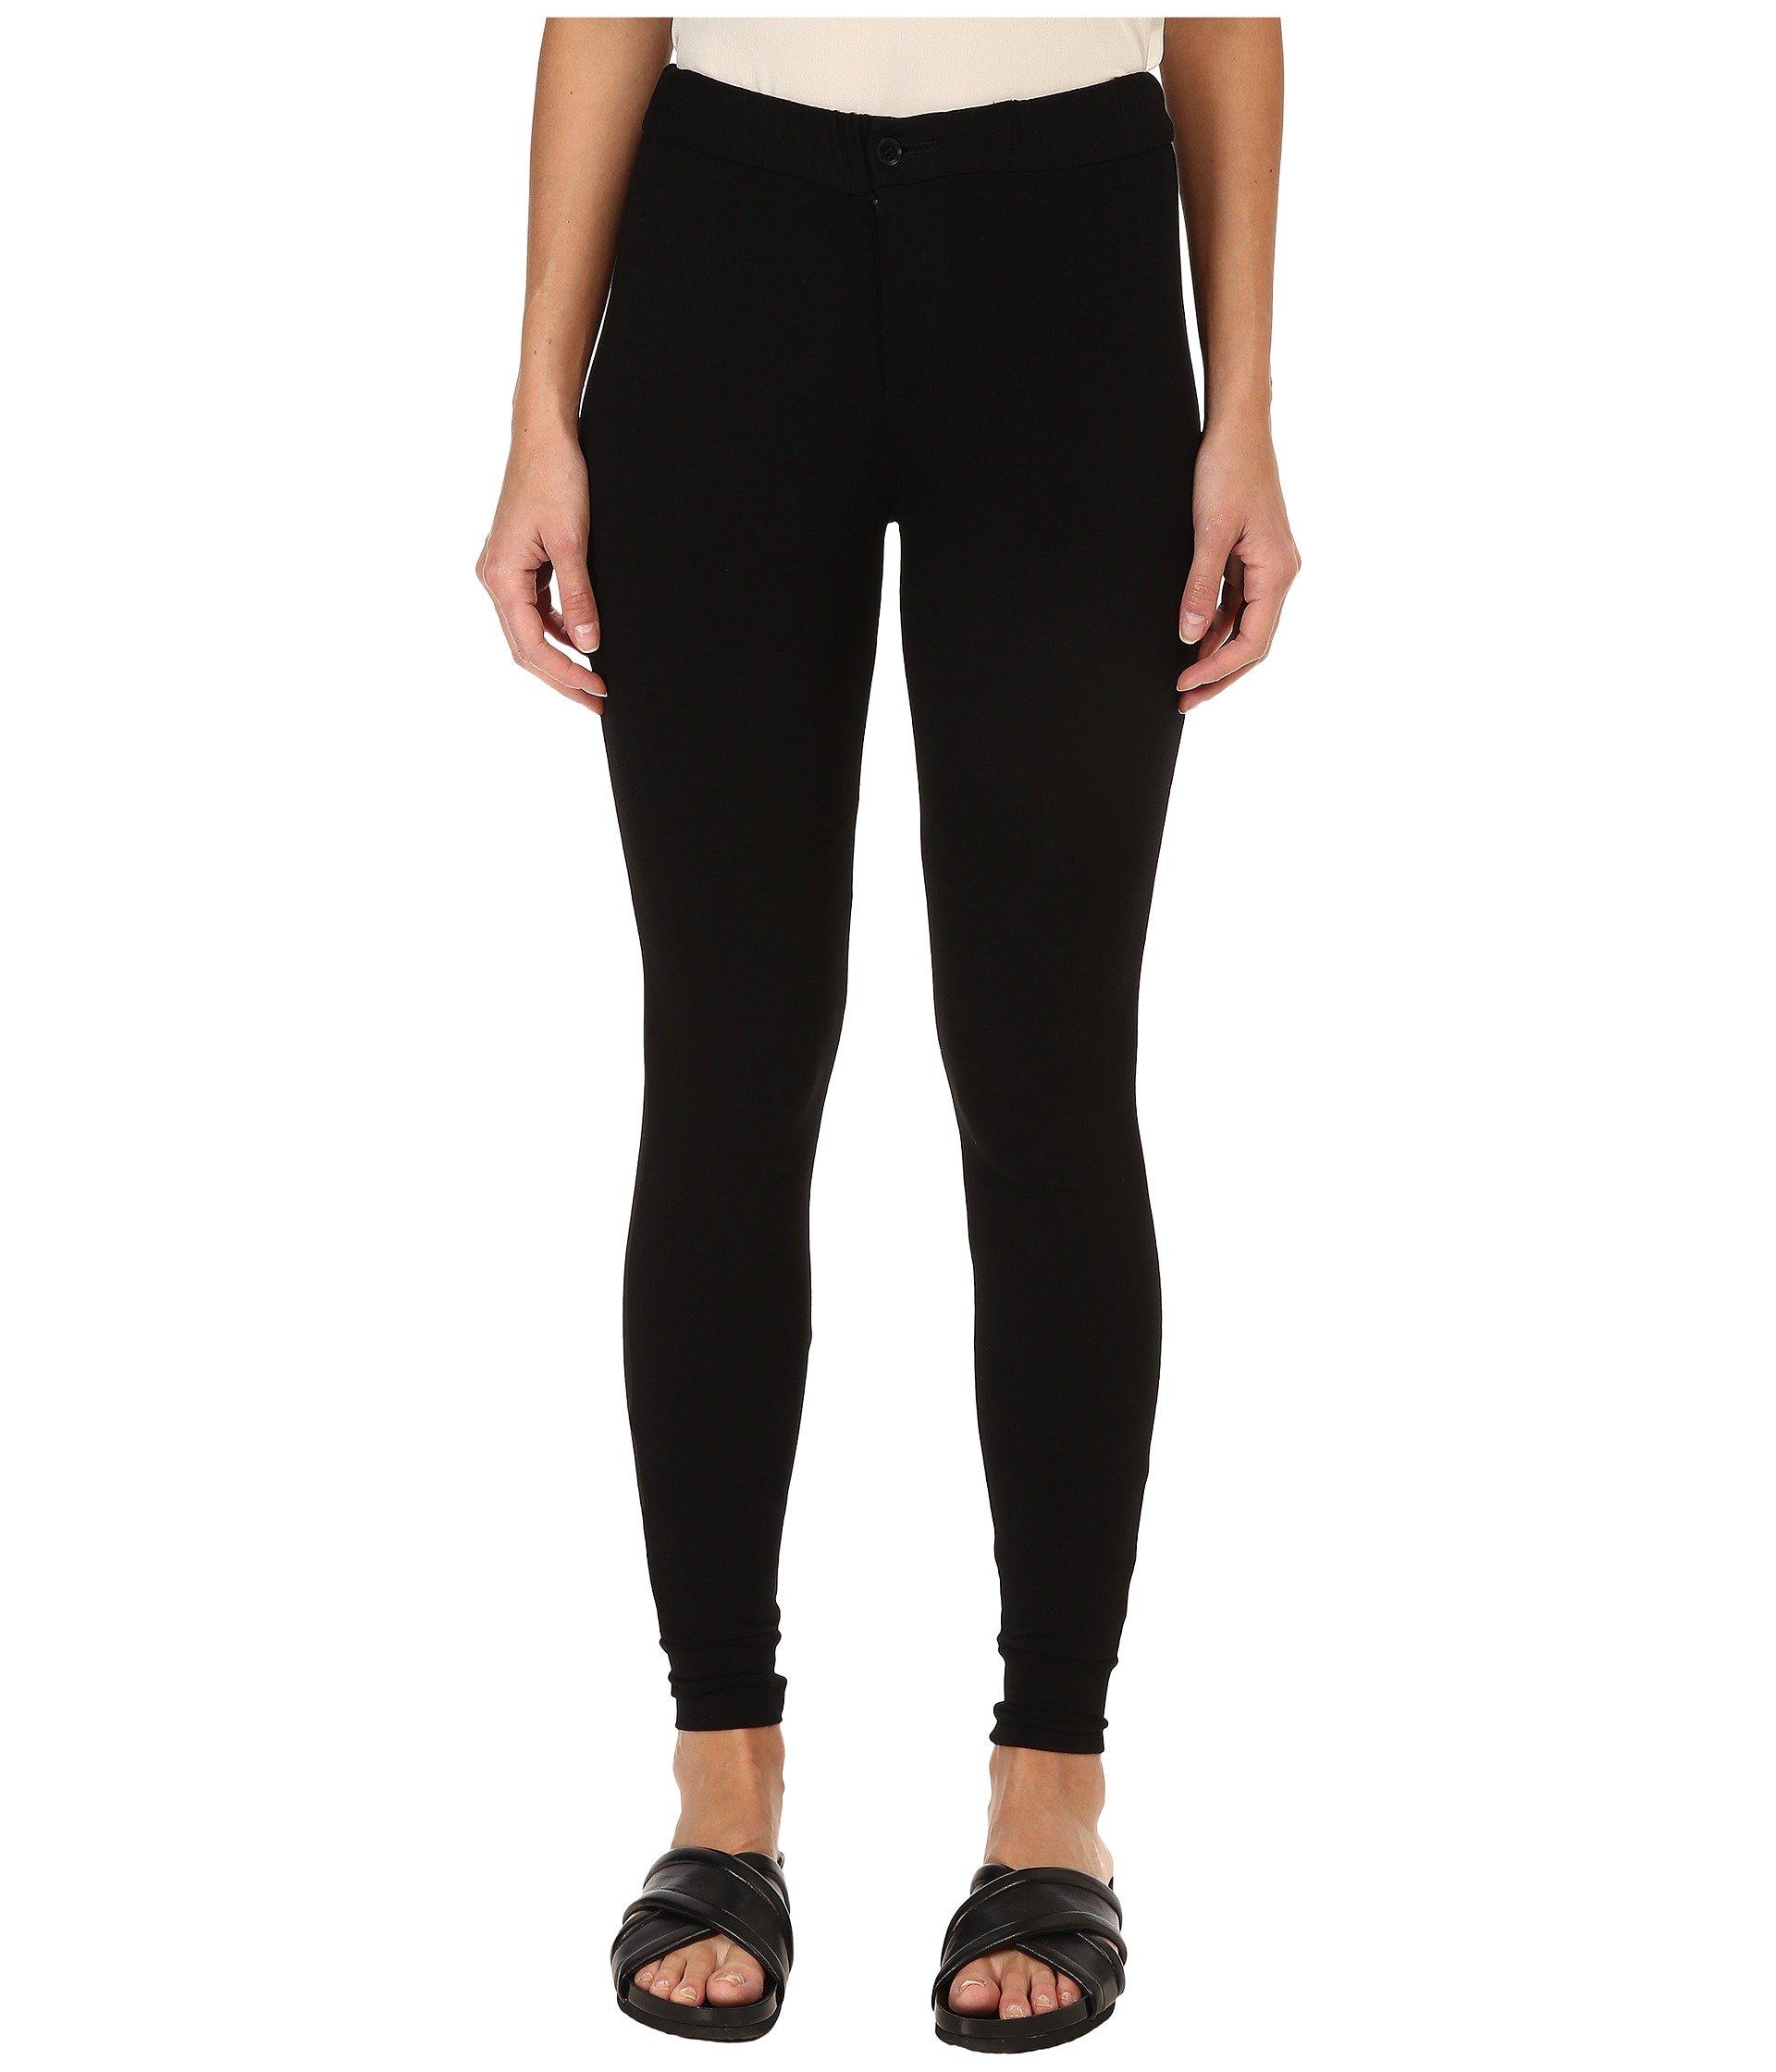 Pantalón para Mujer Yand#39;s by Yohji Yamamoto Leggings  +